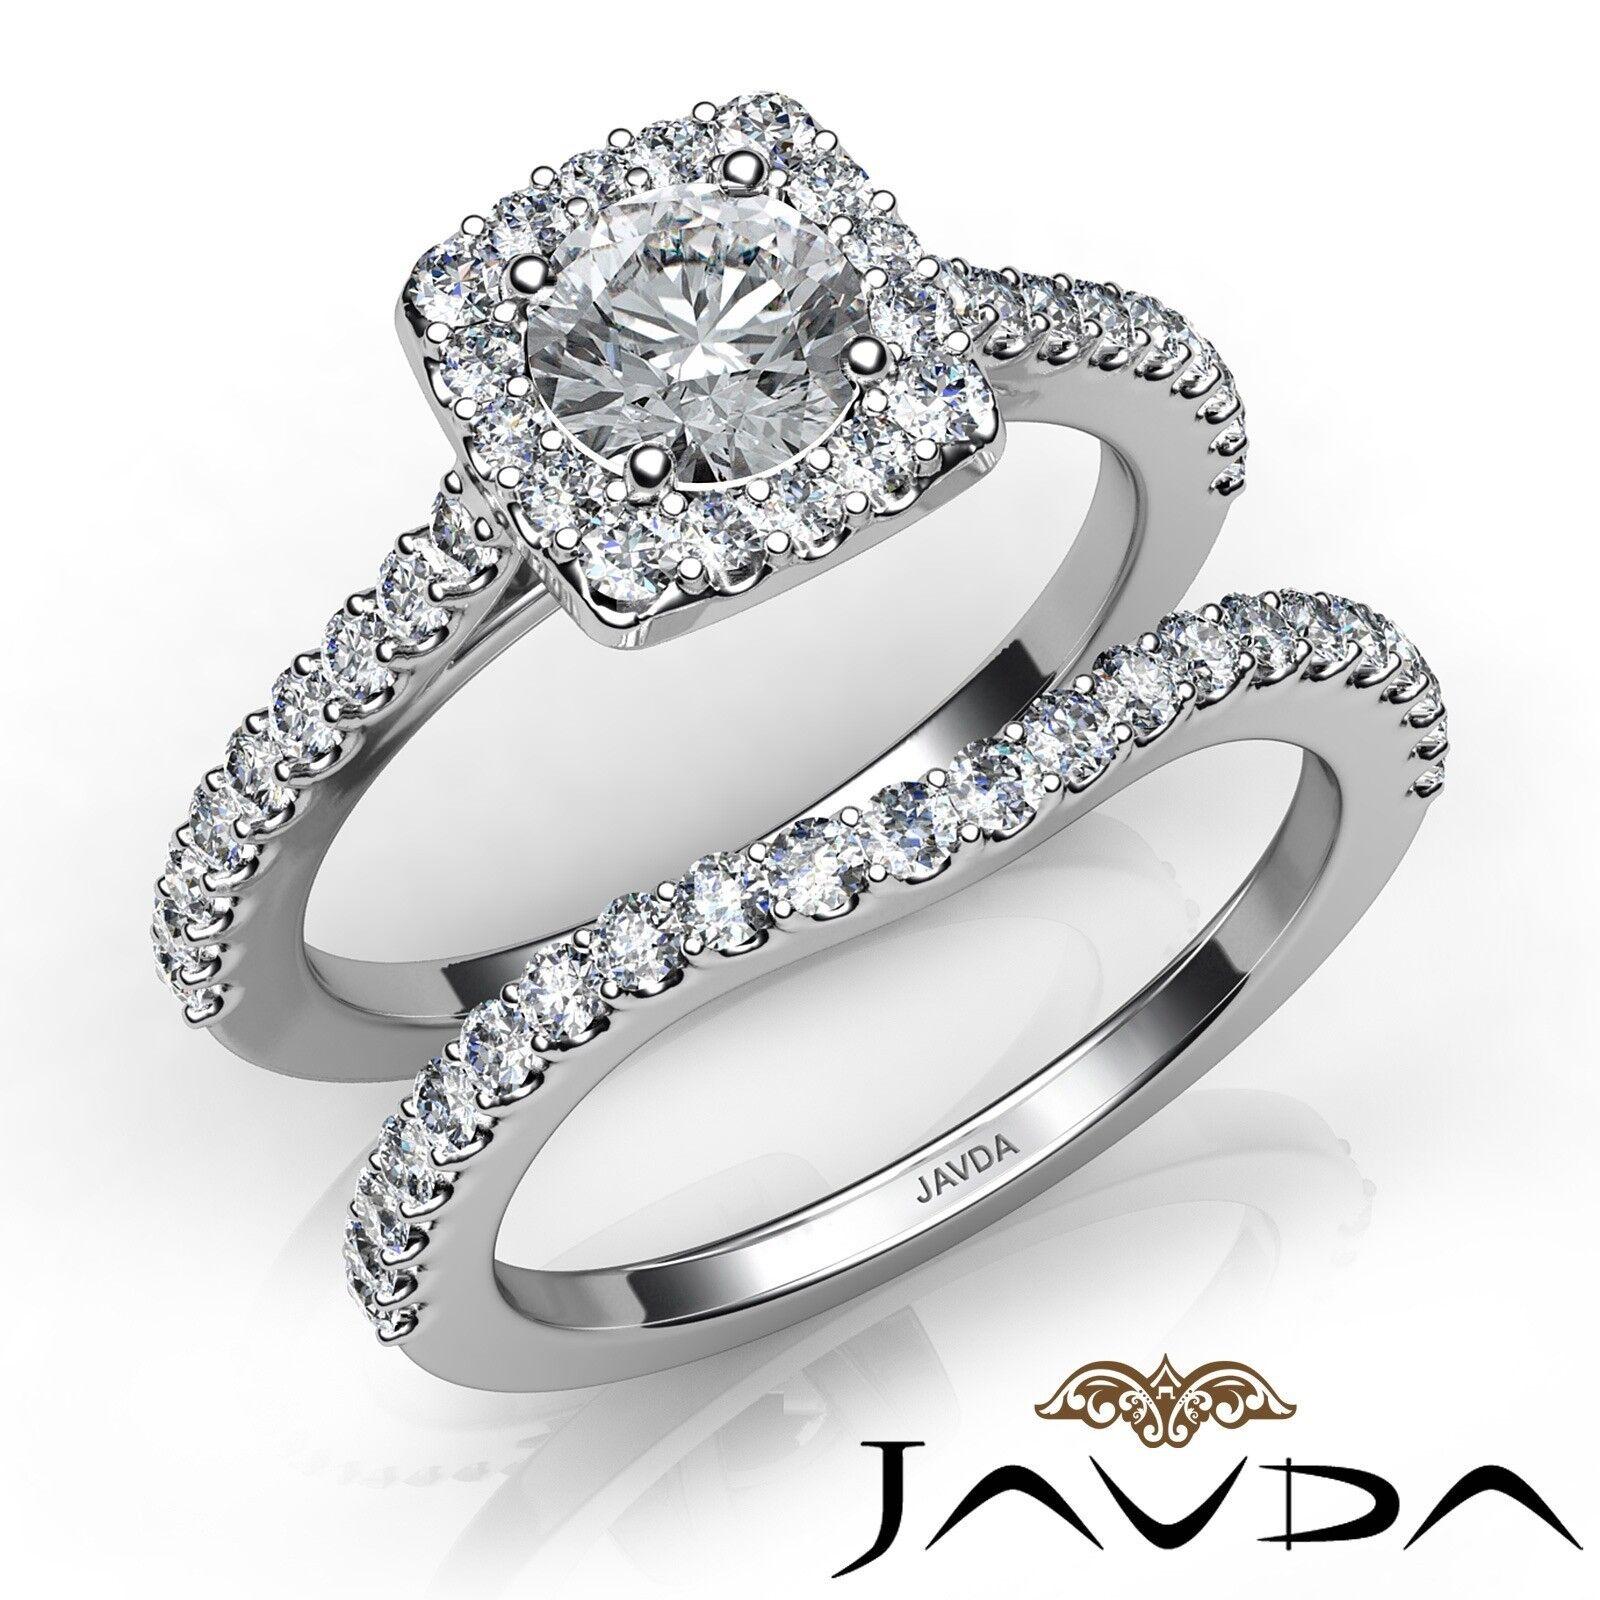 1.4ctw Halo U Prong Bridal Set Round Diamond Engagement Ring GIA E-VVS2 W Gold